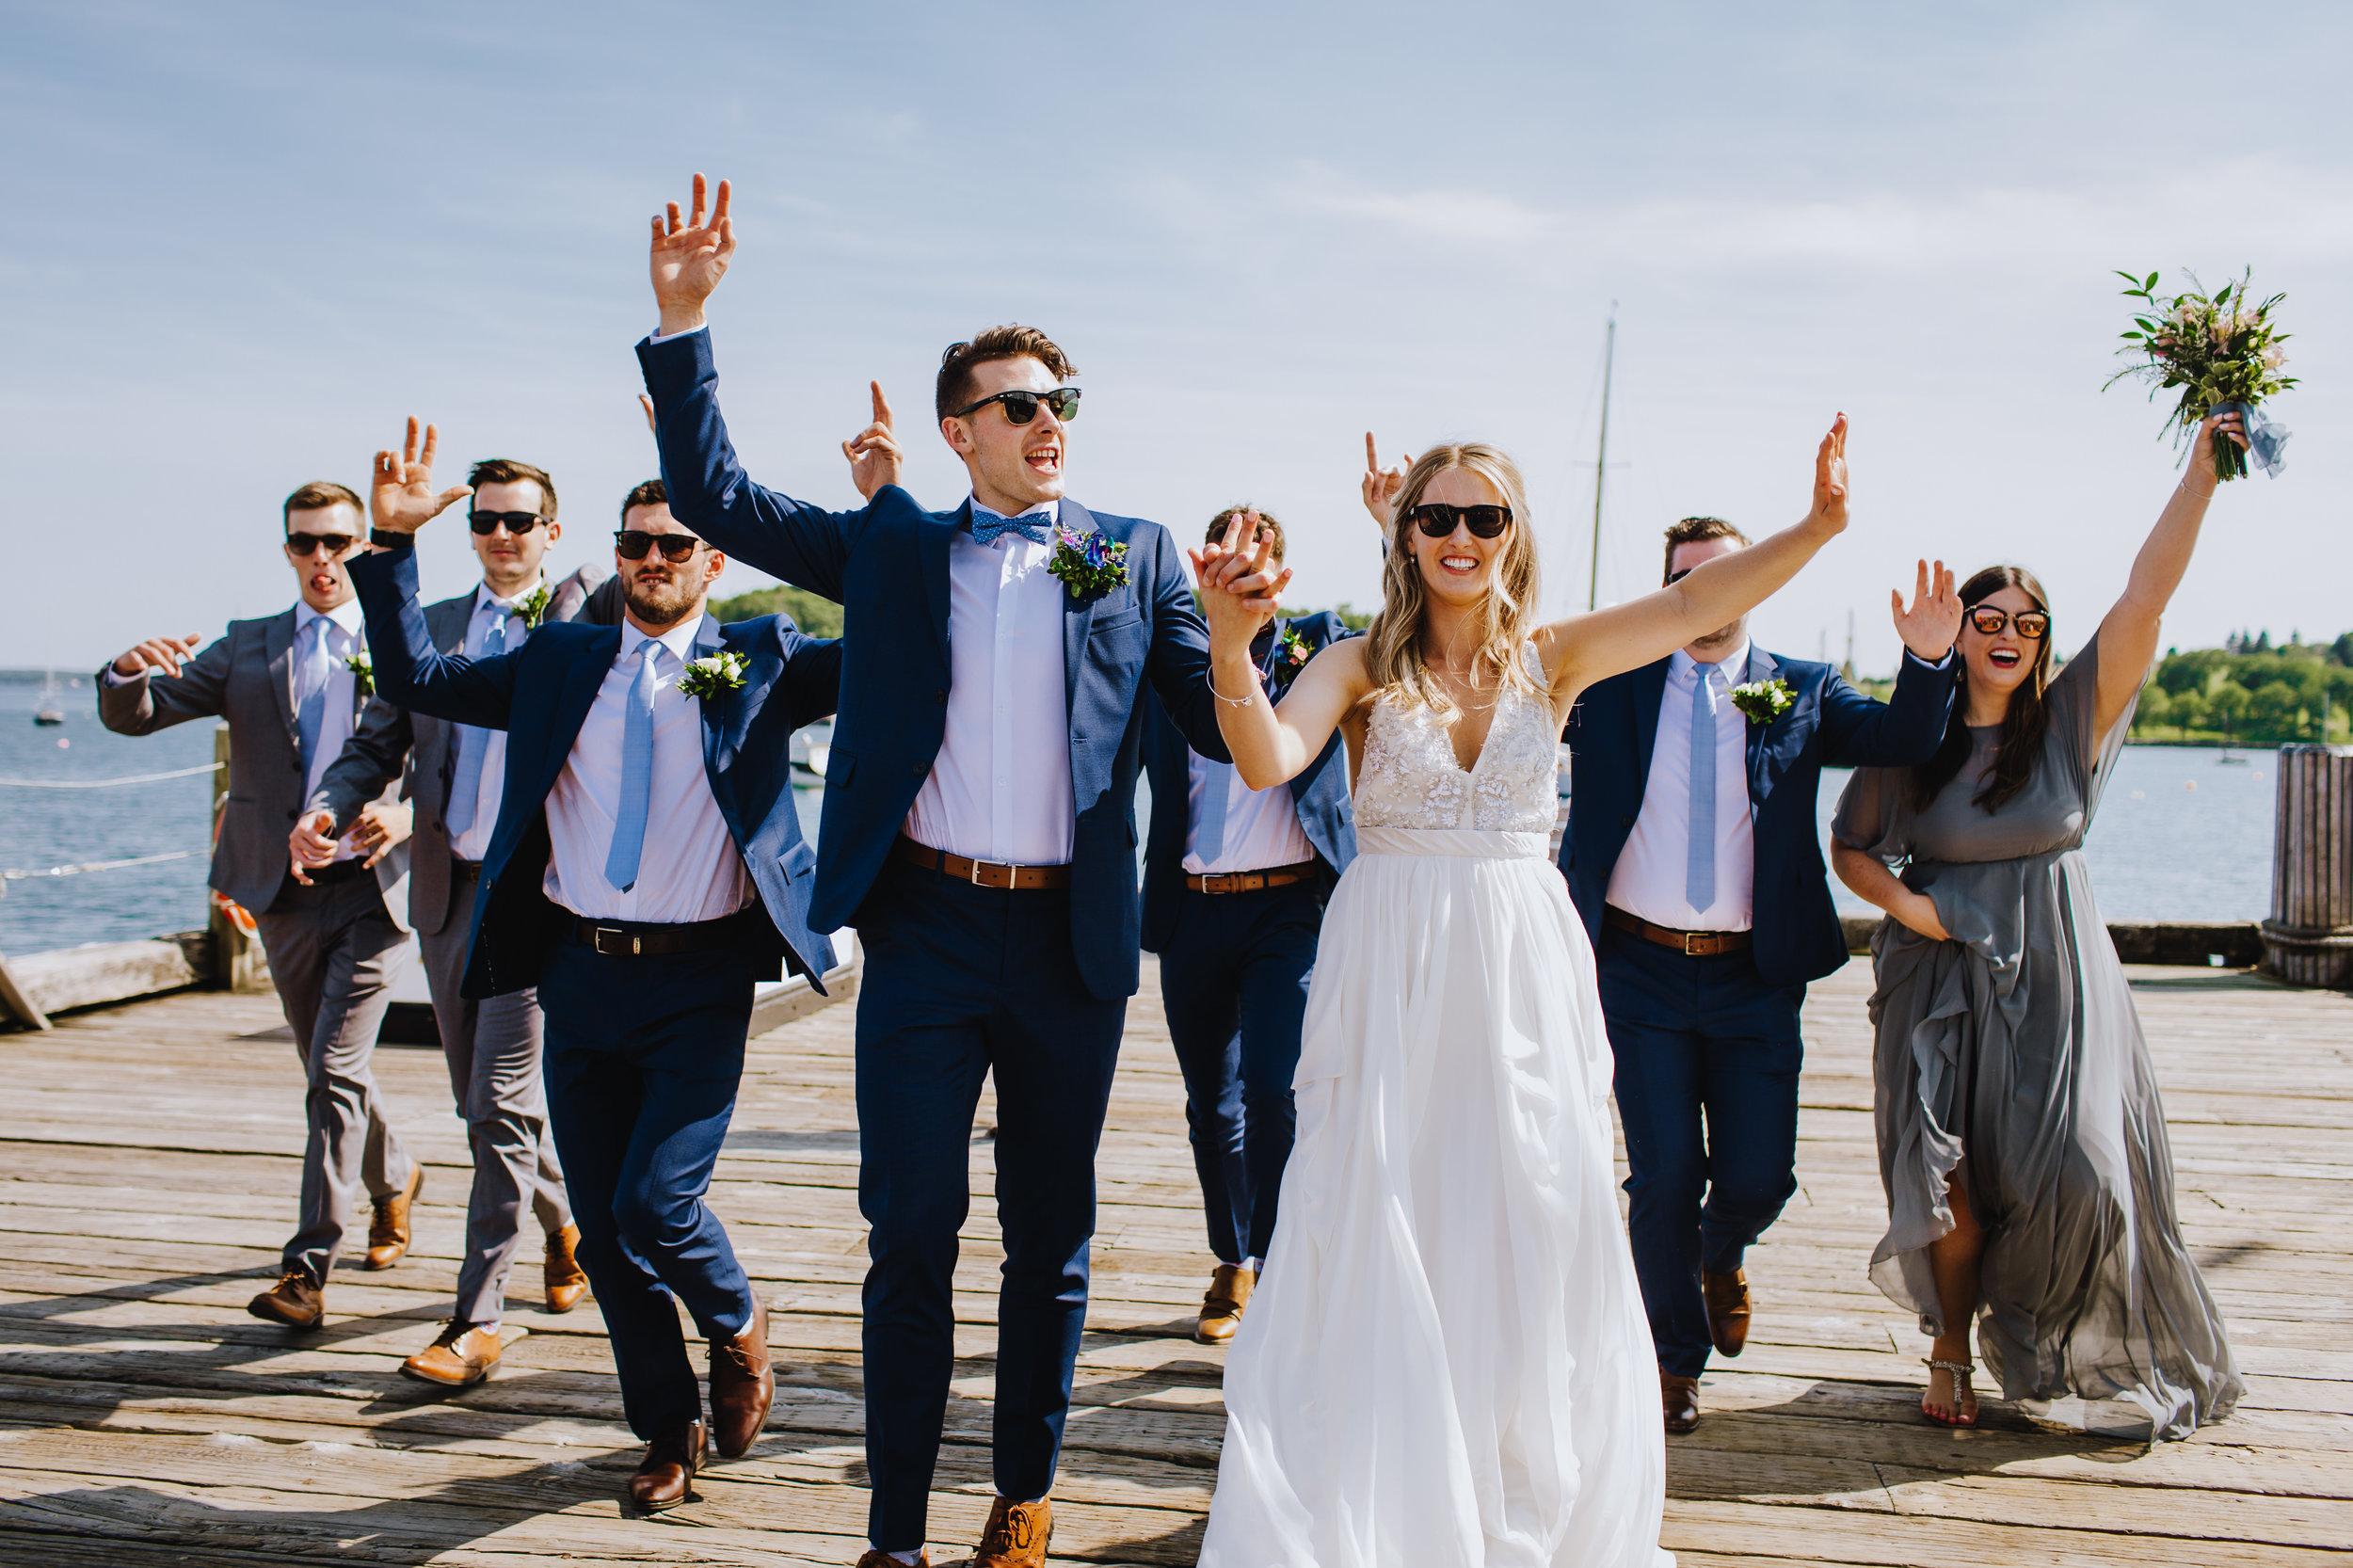 BOSCAWEN-INN-LUNENBURG-WEDDING-DAVE-AND-PRING-PHOTOGRAPHY-SOUTH-SHORE-LUNENBURG-BLUE-NOSE0-BRIDE-GROOM-GROOMSMEN-ENTOURAGE